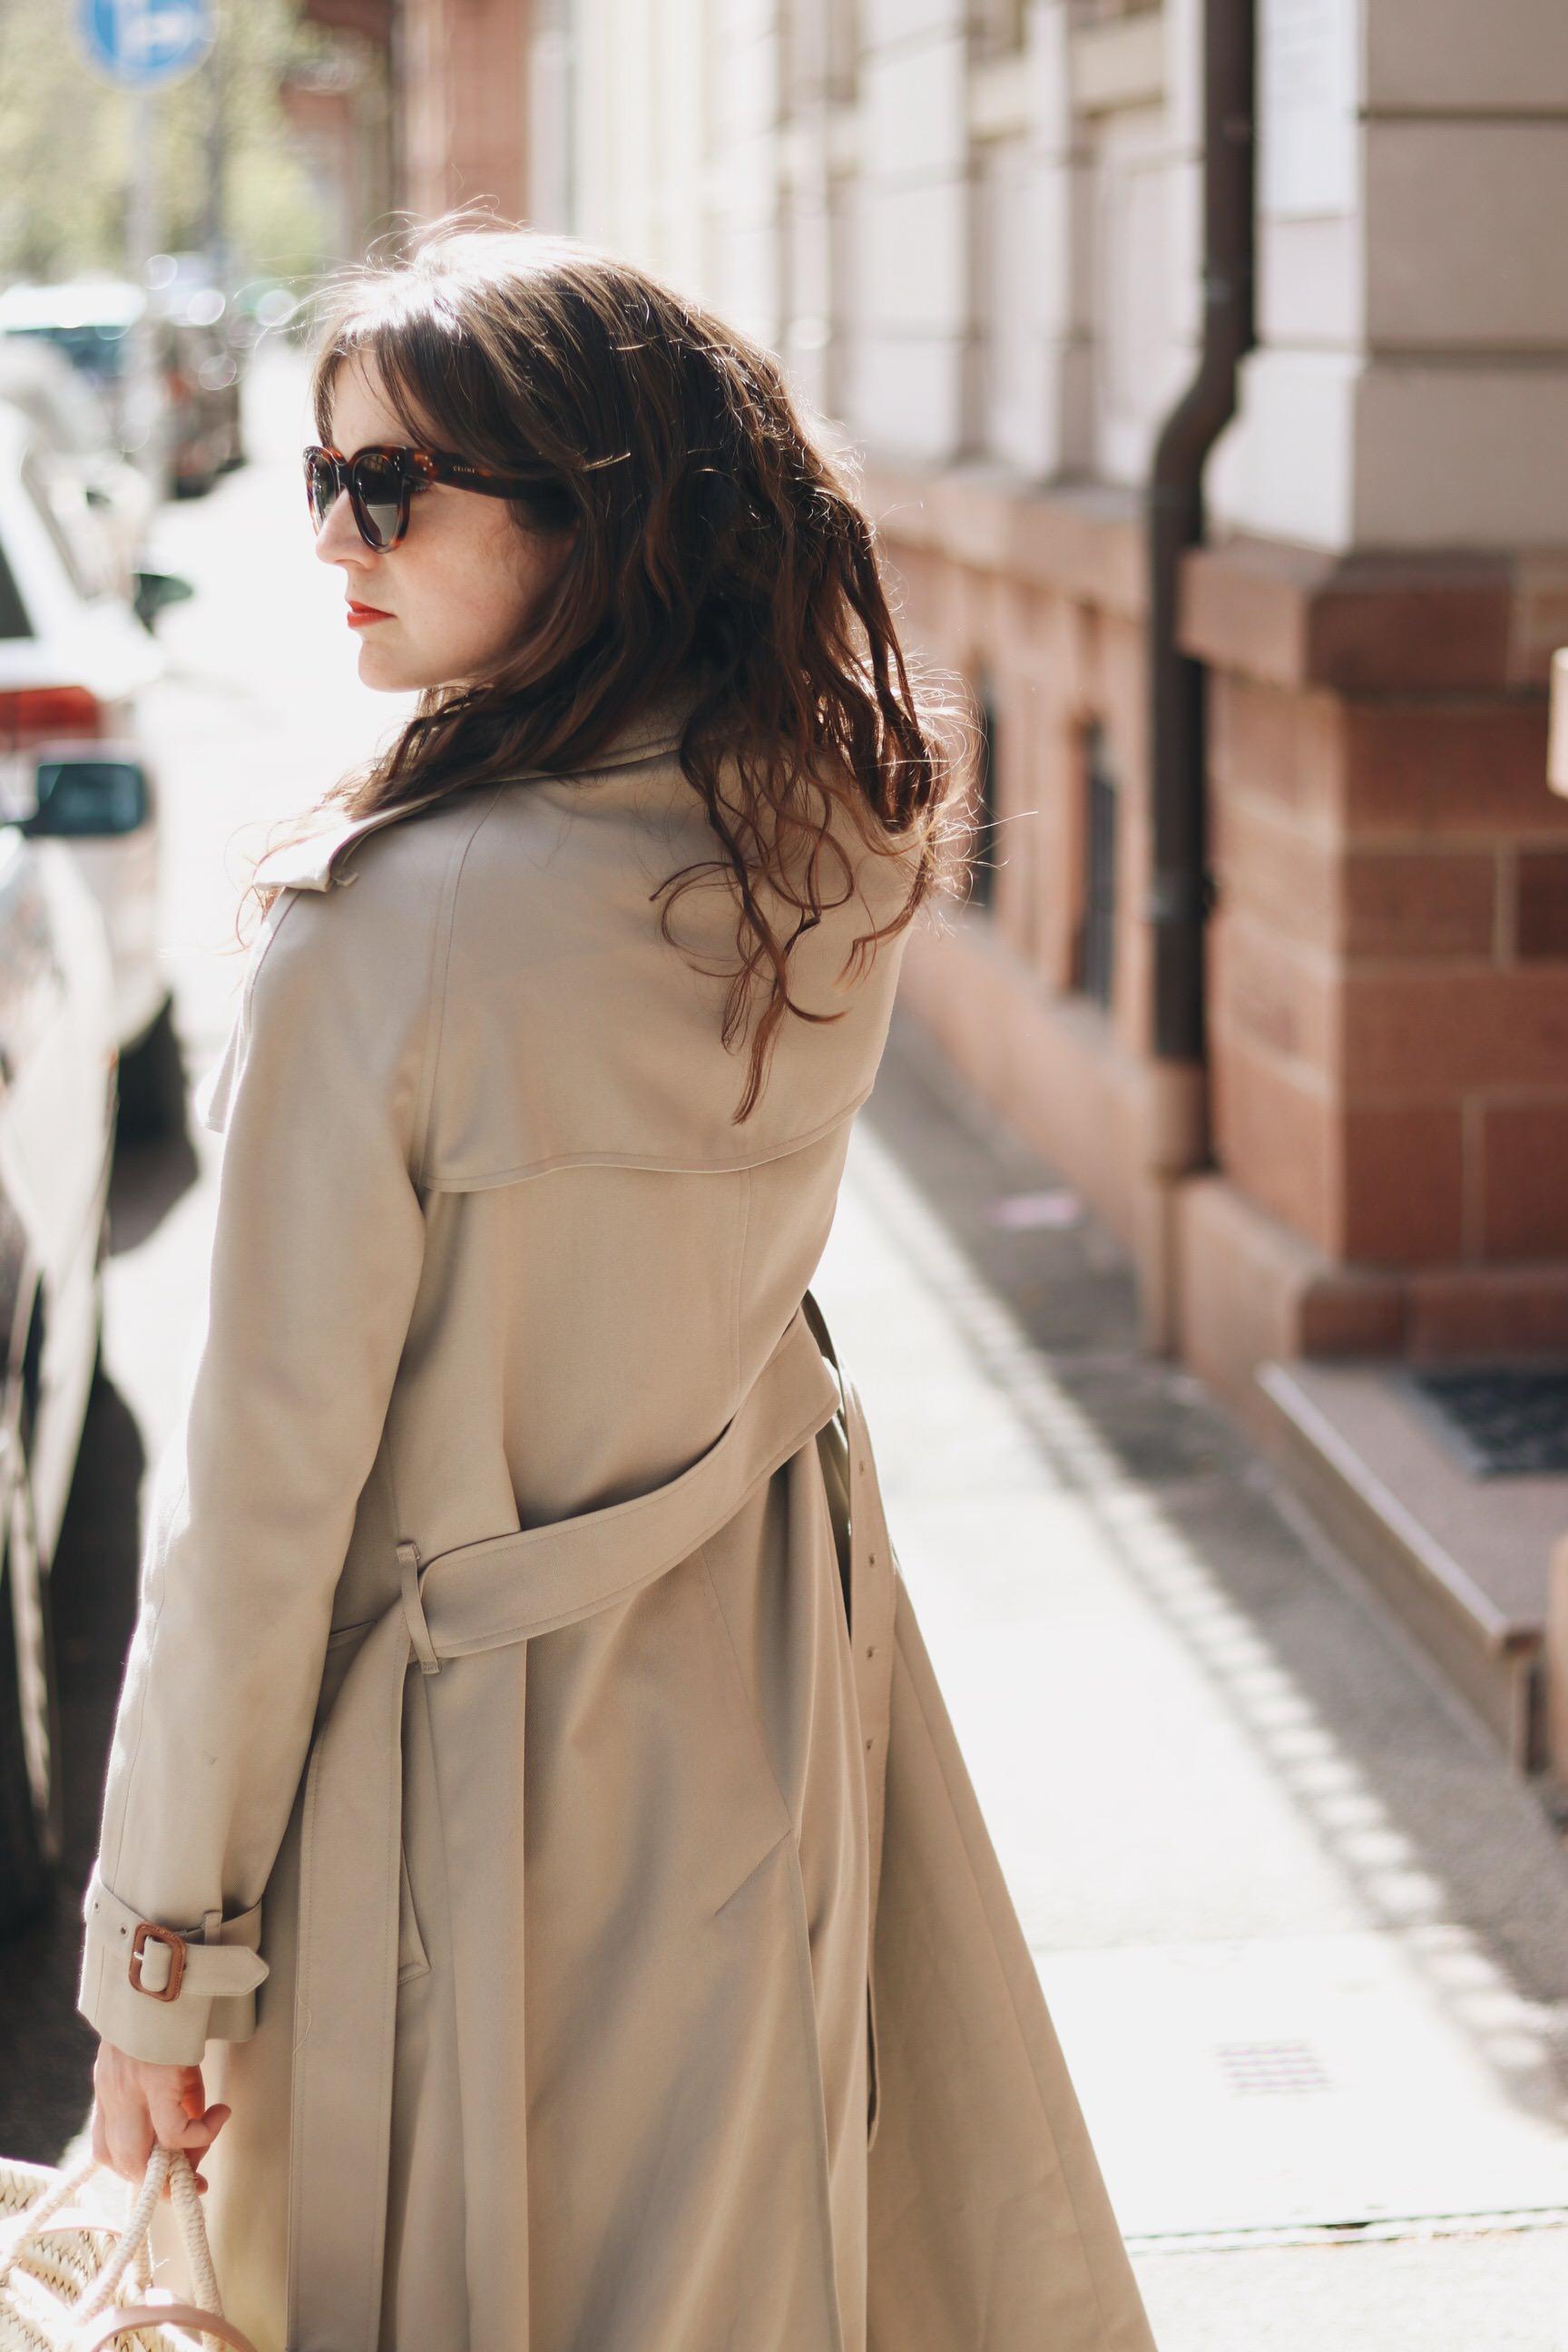 Modeblog Top 10 Outfit Streetstyle burberry Trenchcoat Berlin Sommer Look Neele Modebloggerin